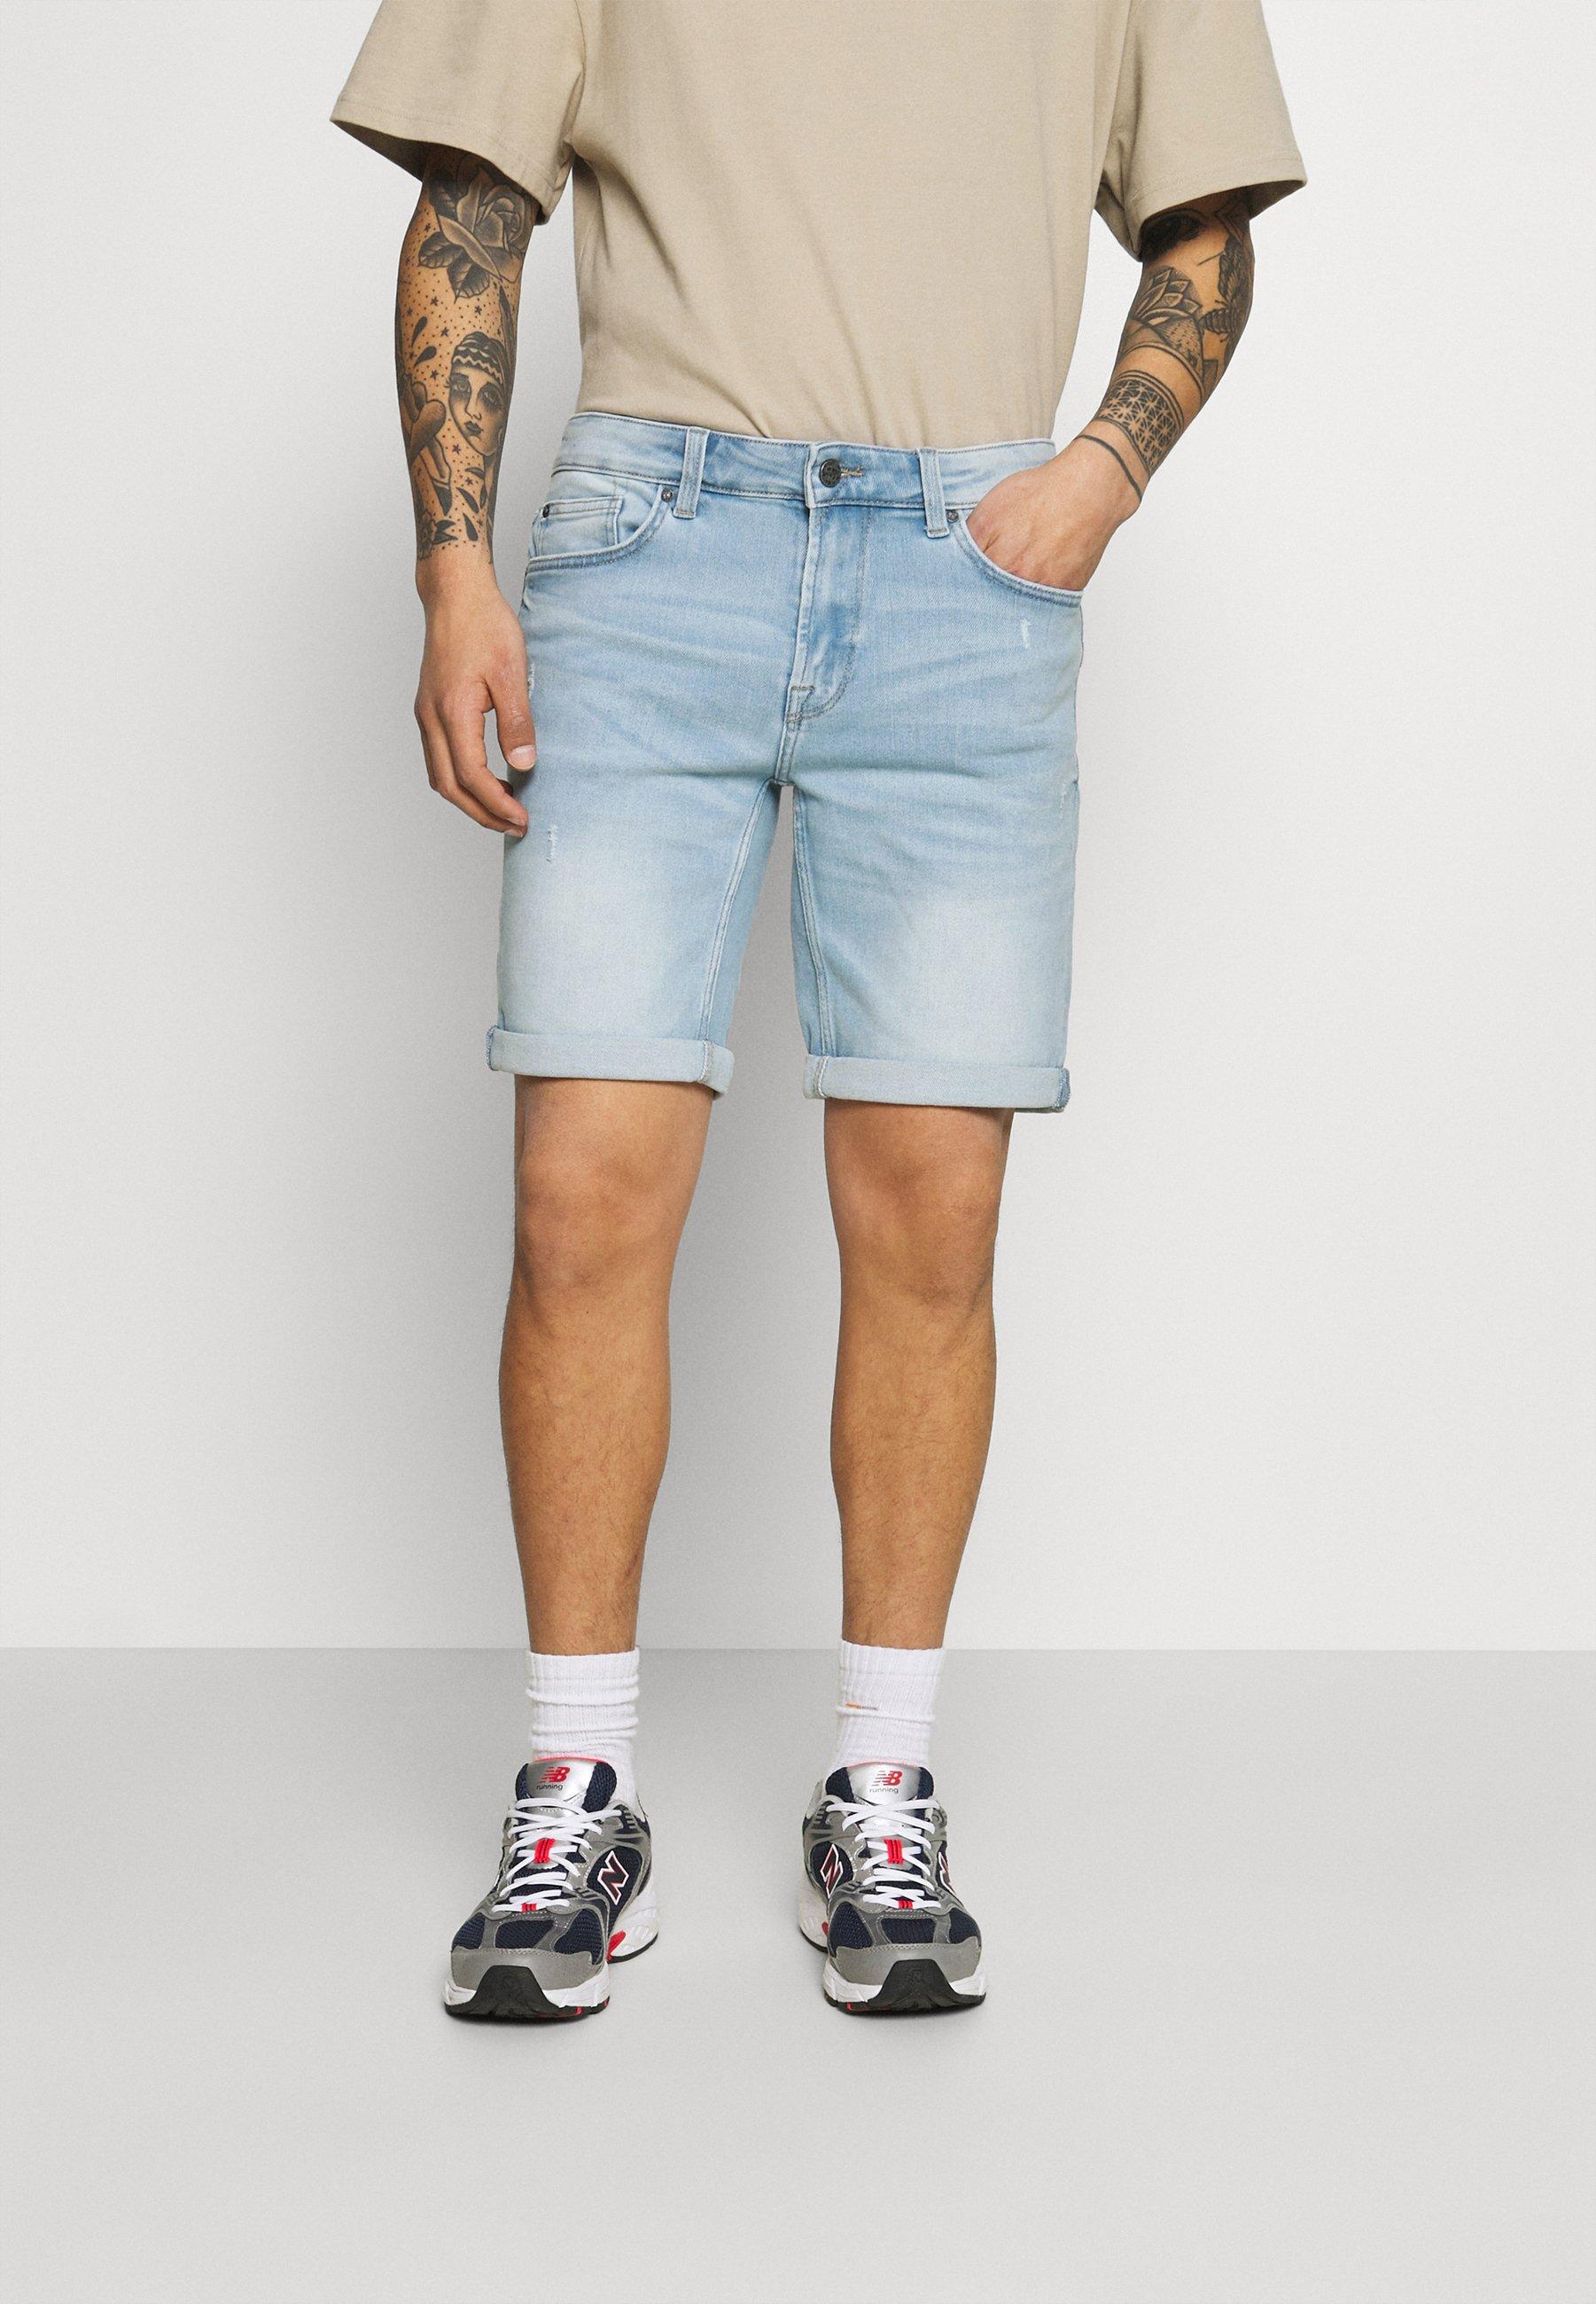 Homme ONSPLY LIFE REG BLUE  - Short en jean - blue